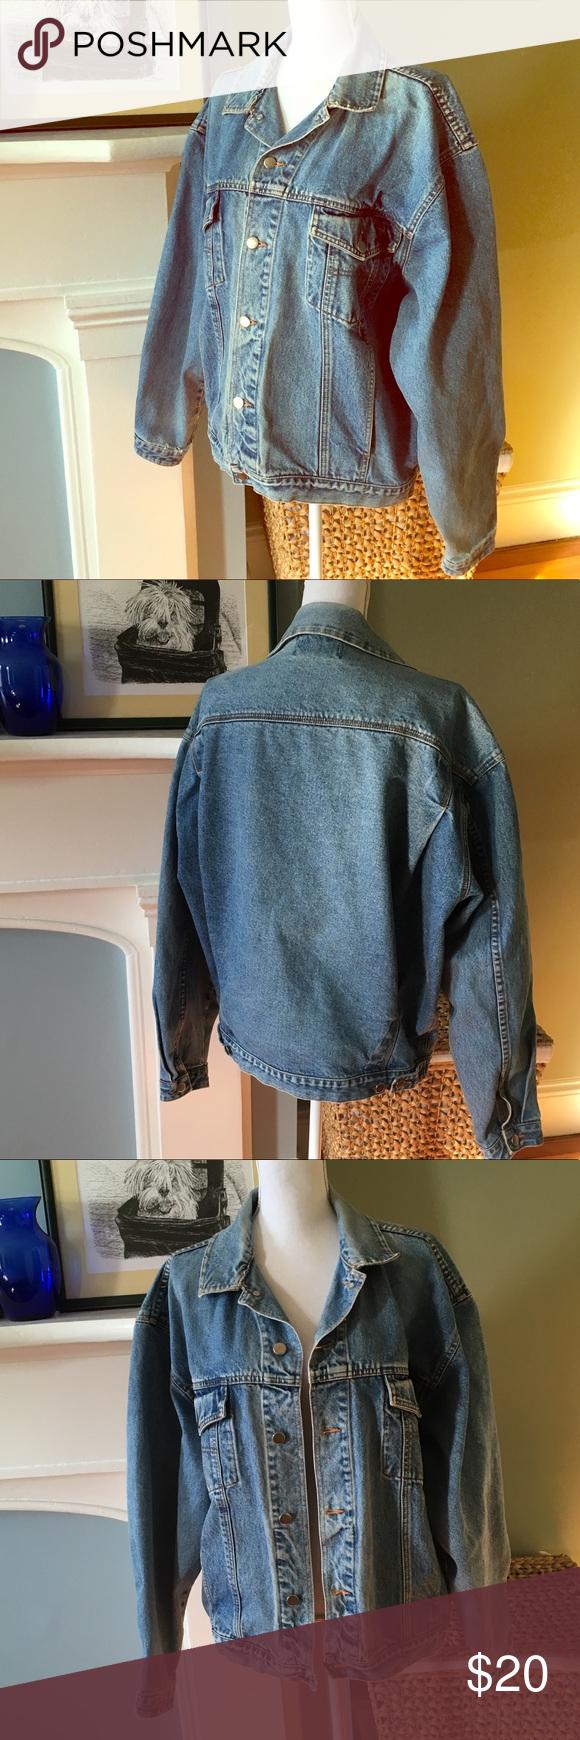 Britches Great Outdoors Vintage Men S Denim Jacket Denim Jacket Vintage Men Clothes Design